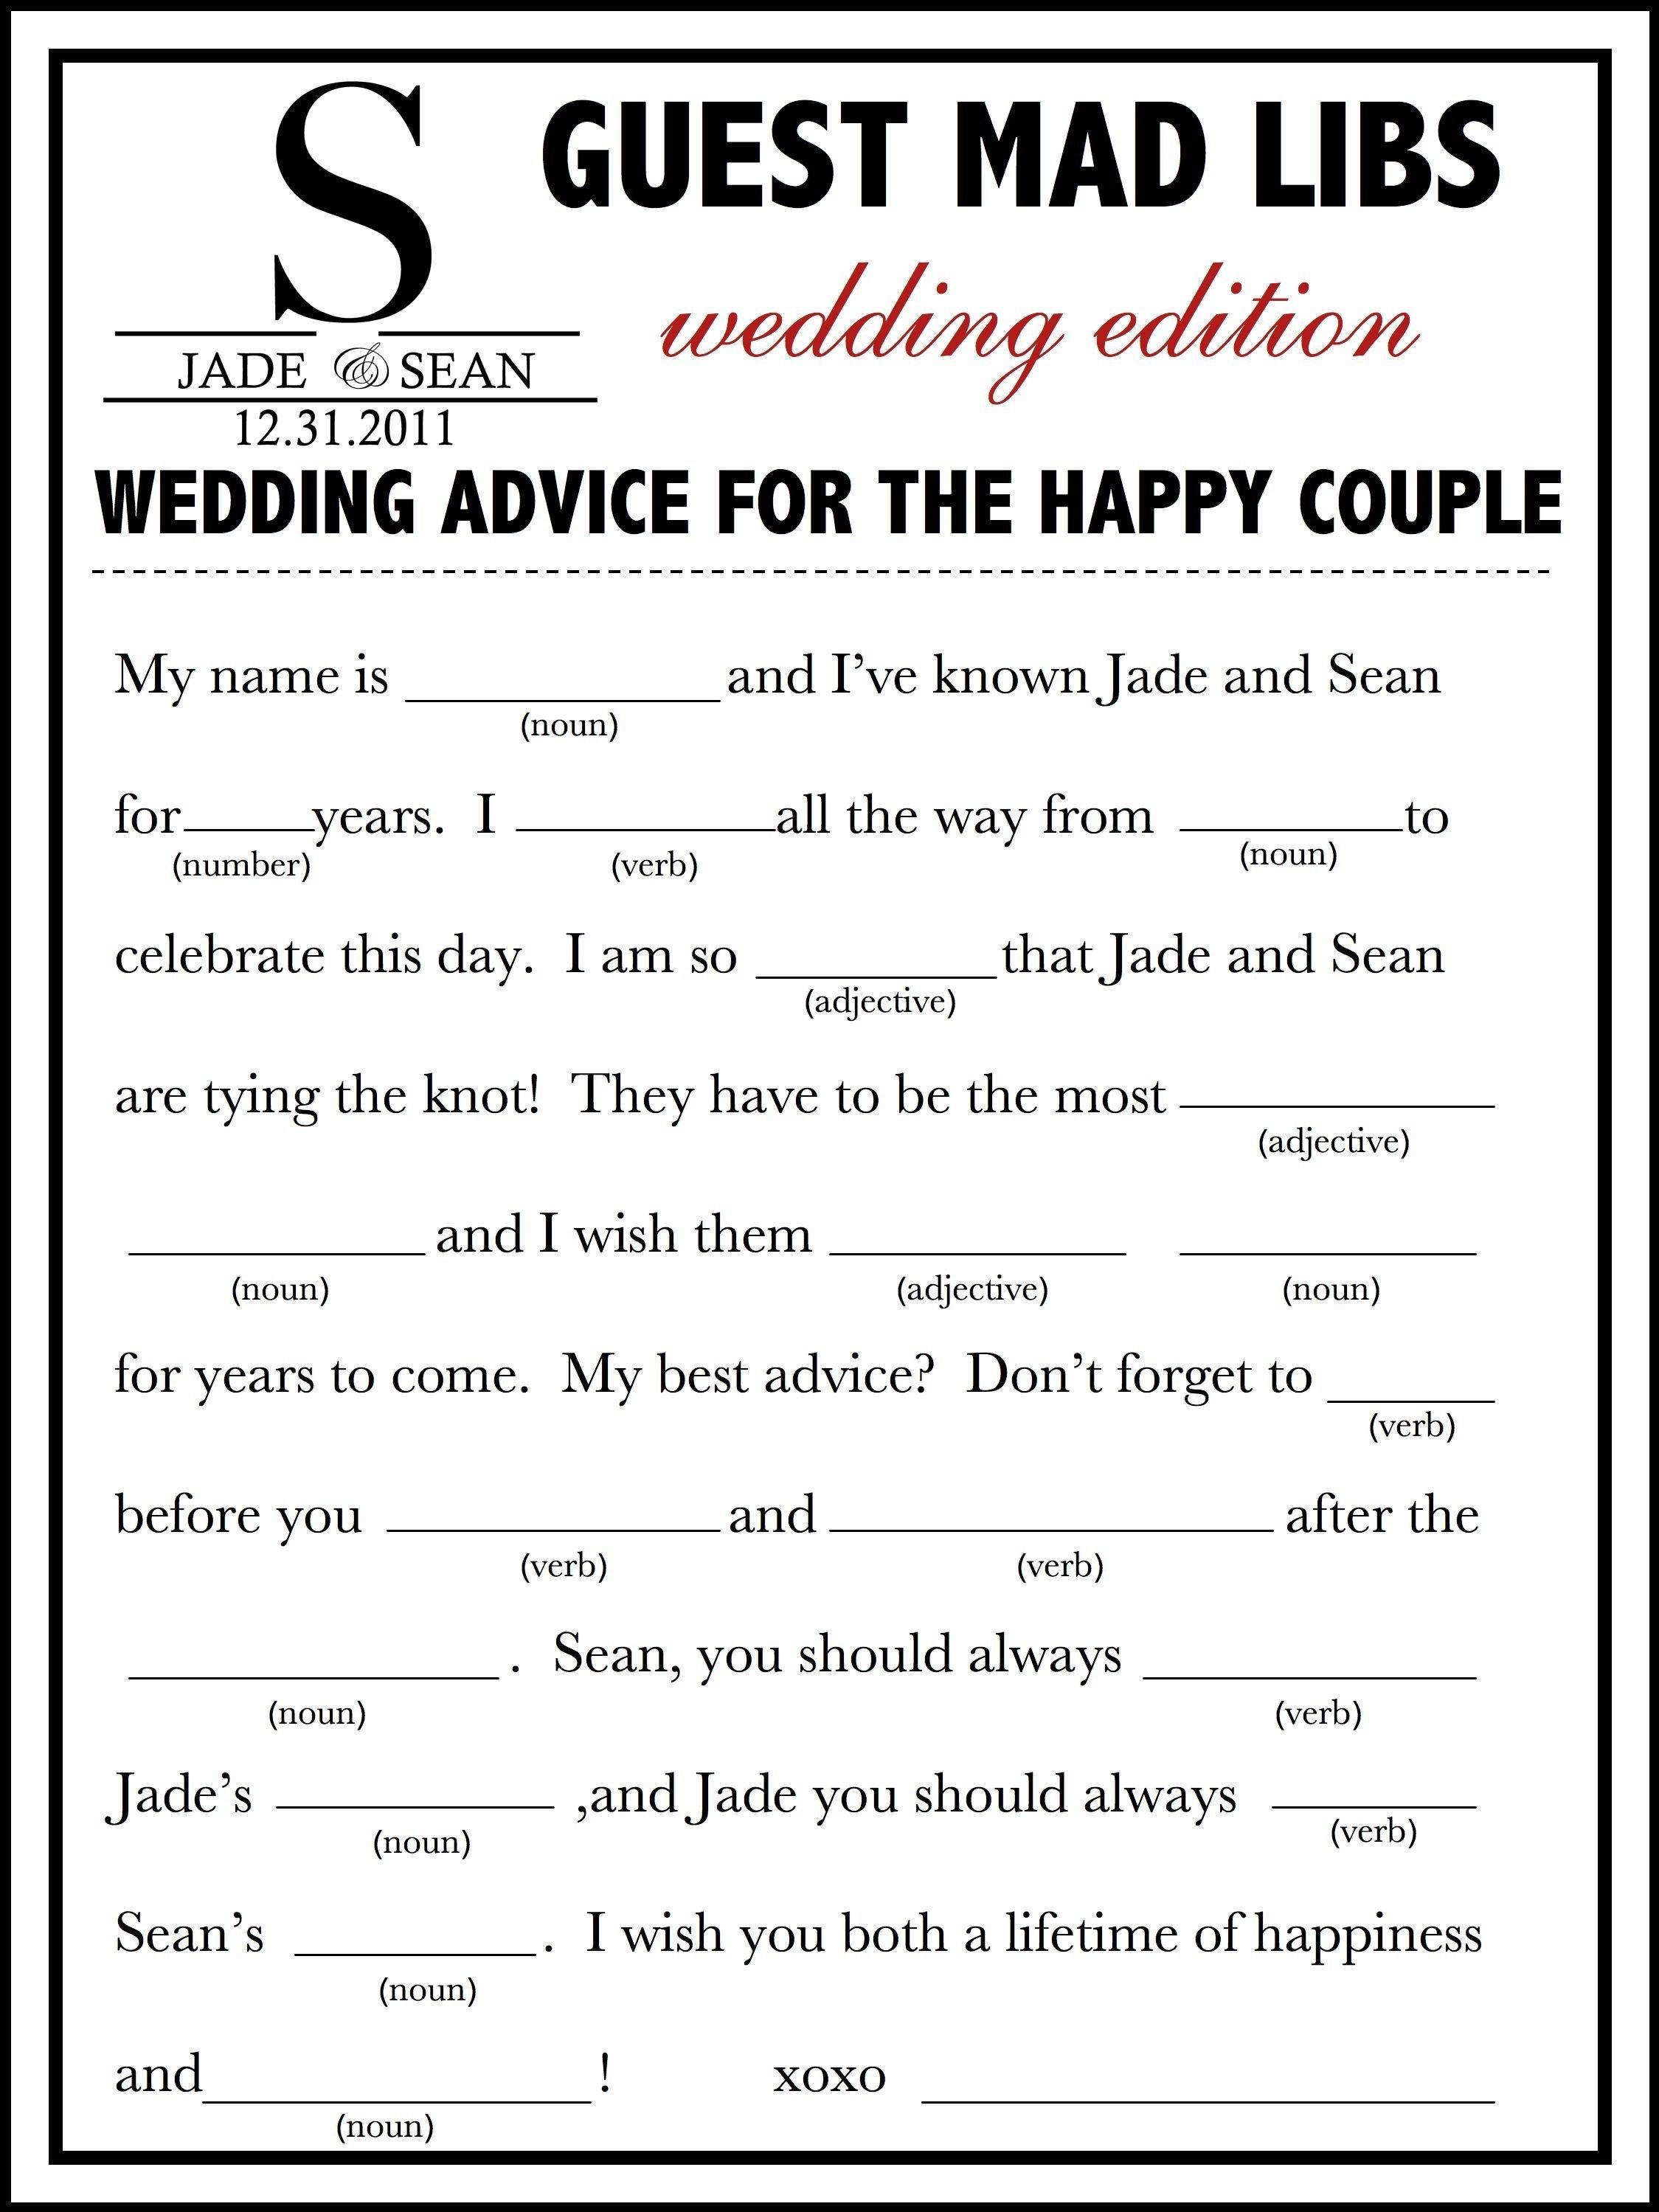 Wedding Mad Libs Template Free | Fun Unique Guest Book Alternative - Free Printable Wedding Mad Libs